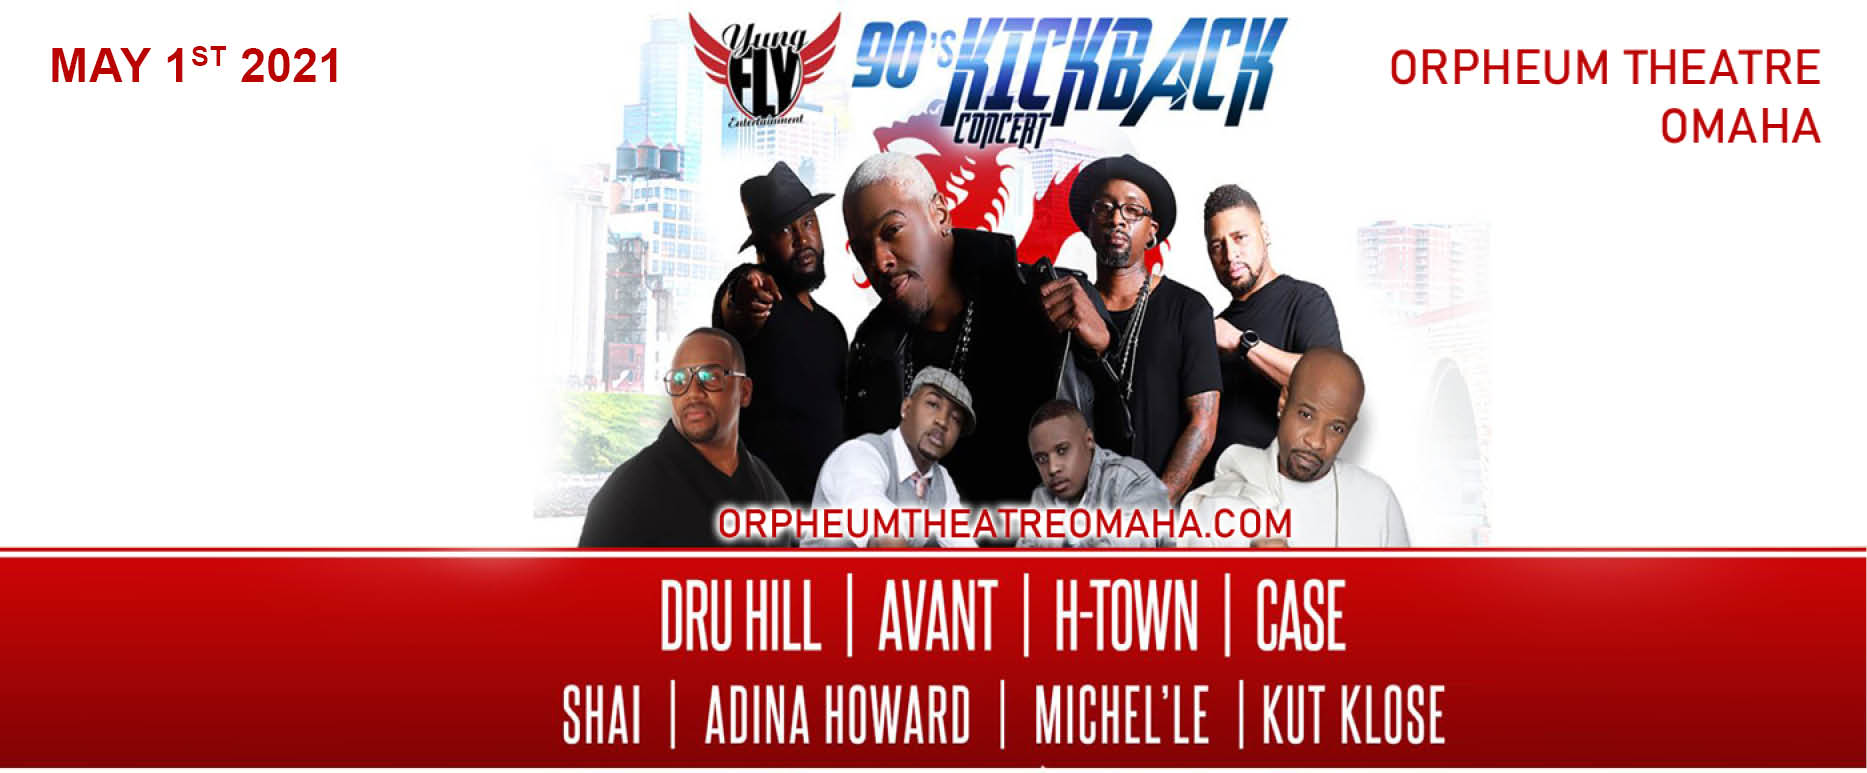 90s Kickback Concert: Dru Hill, Avant, H-Town & Case at Orpheum Theatre Minneapolis